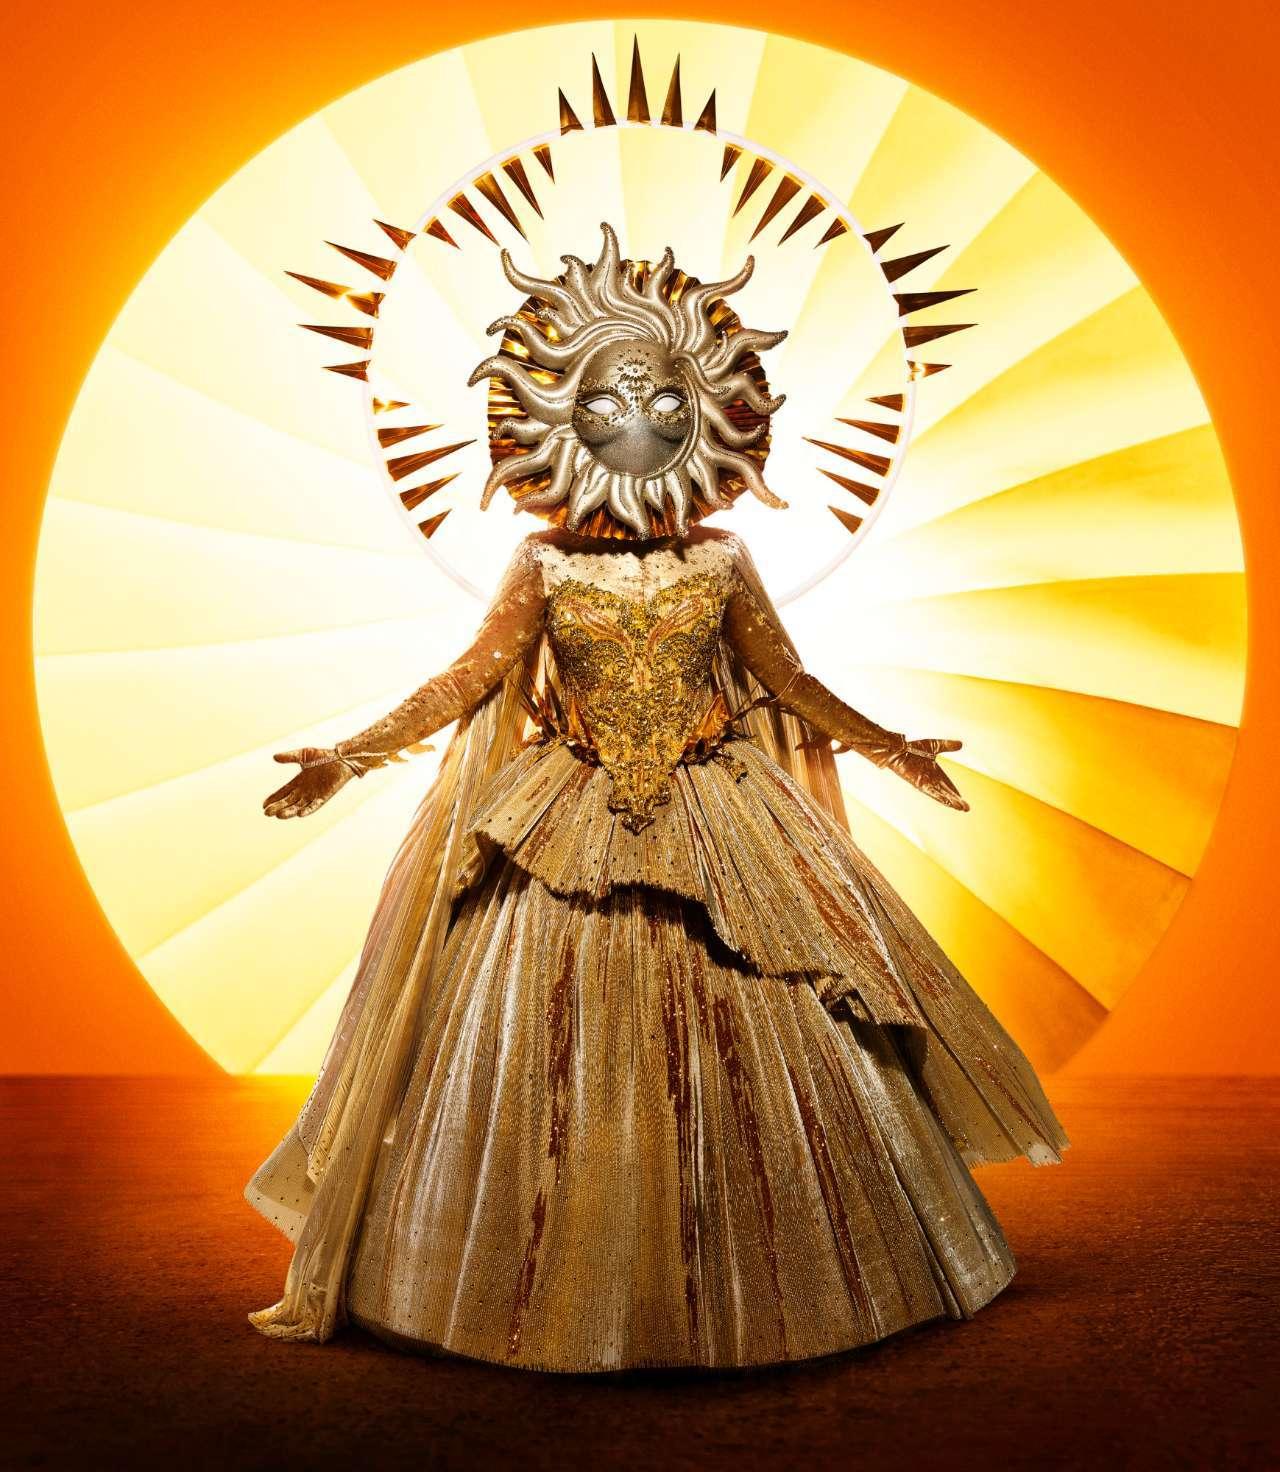 The Masked Singer Sun